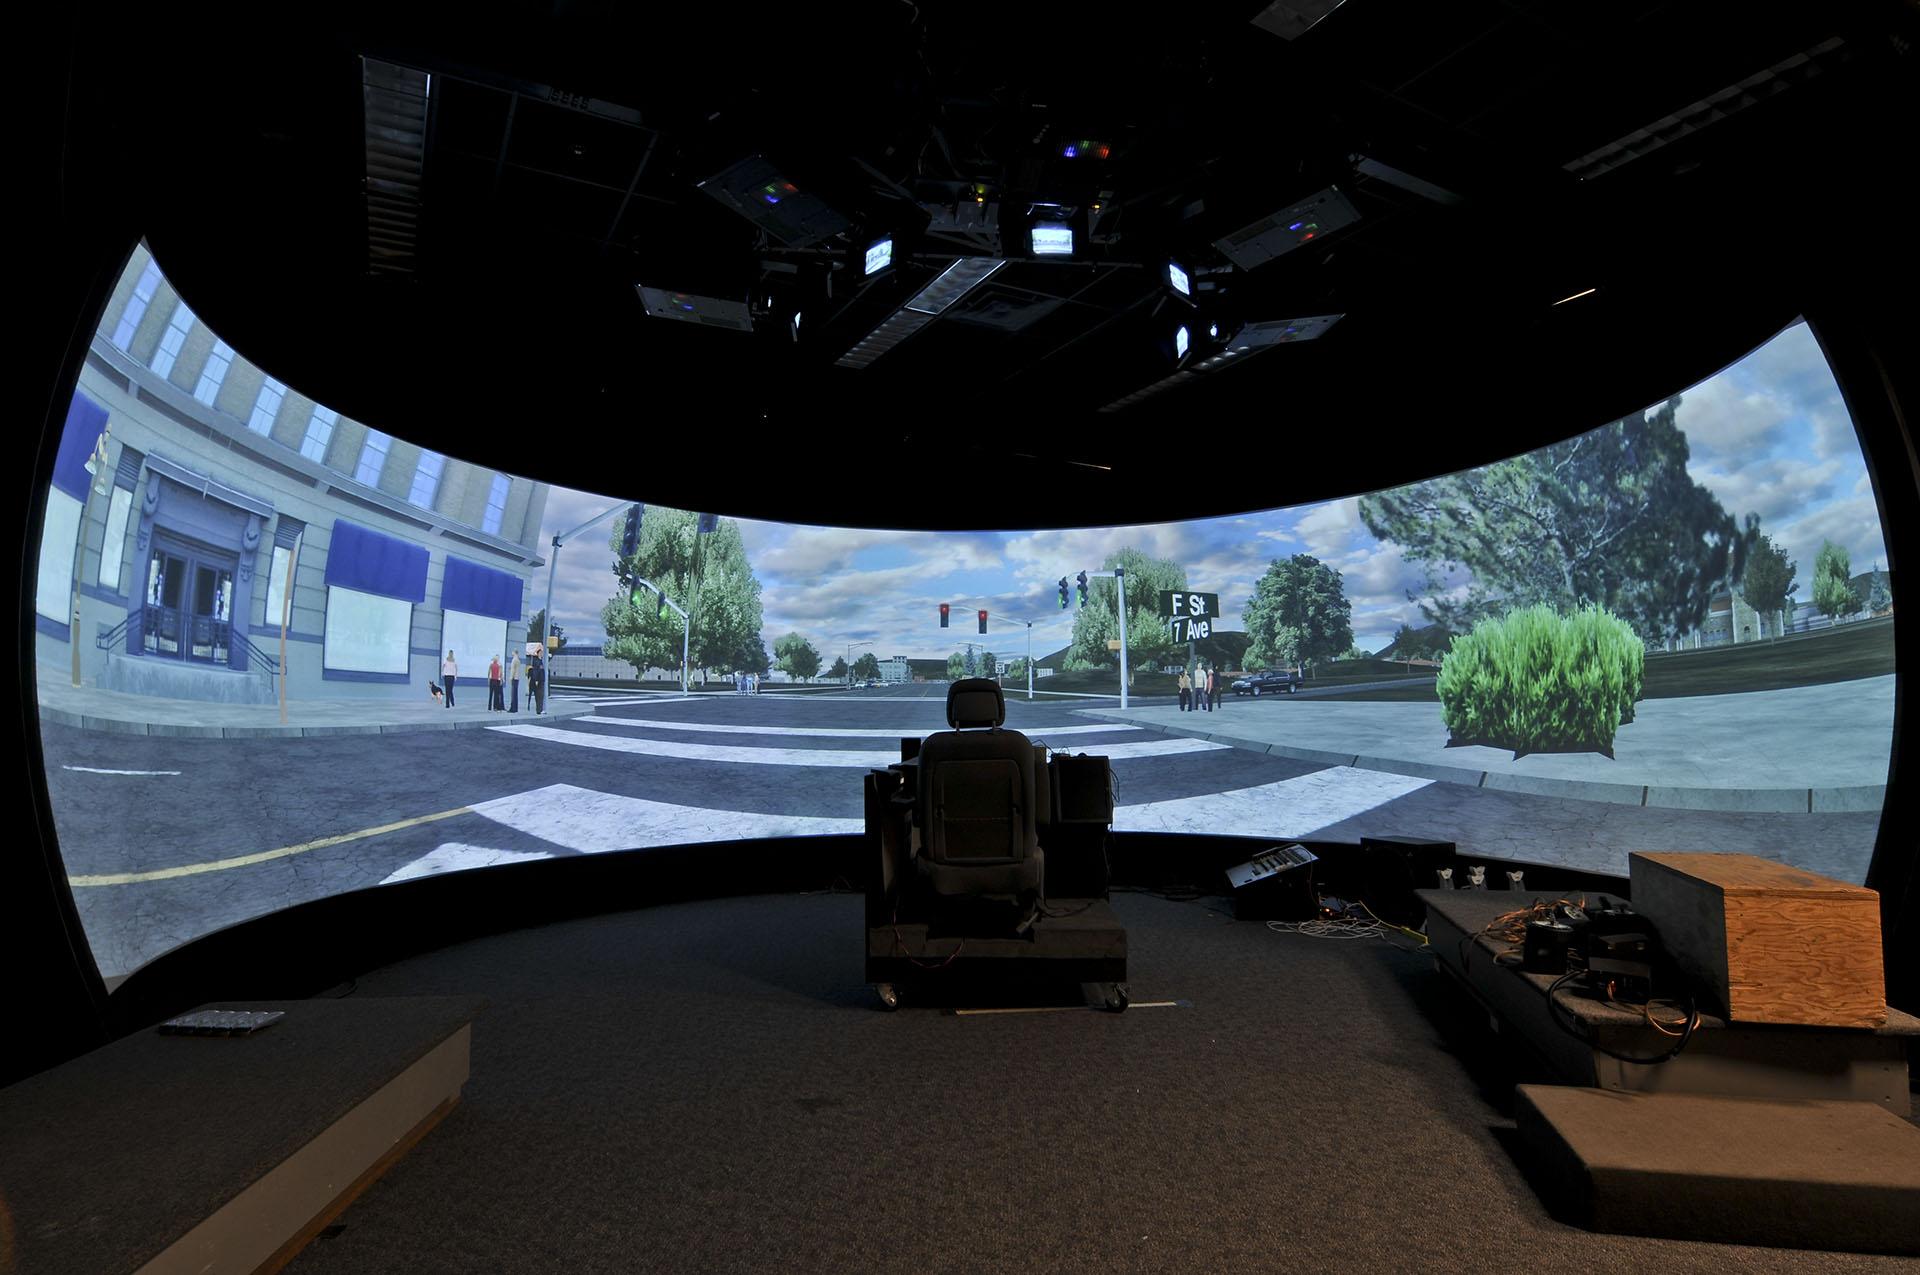 IGI 180 degree projection automotive driving simulator